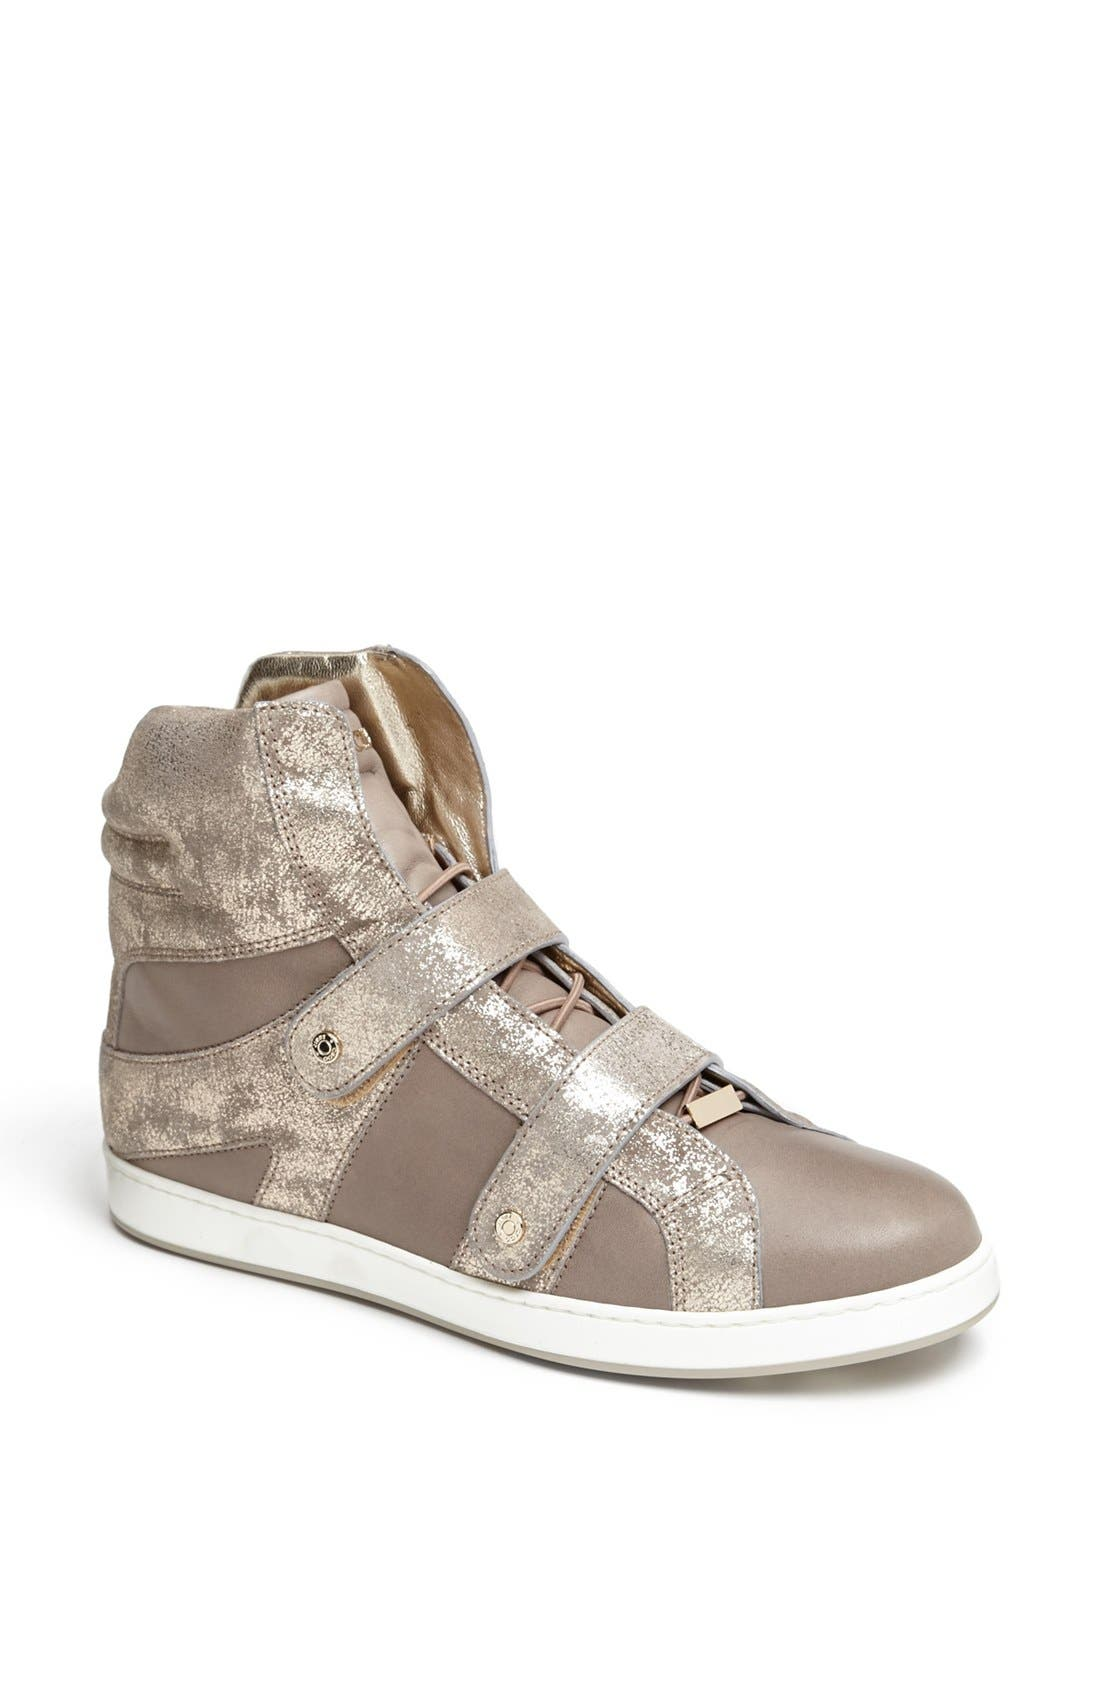 Main Image - Jimmy Choo 'Yazz' Sneaker